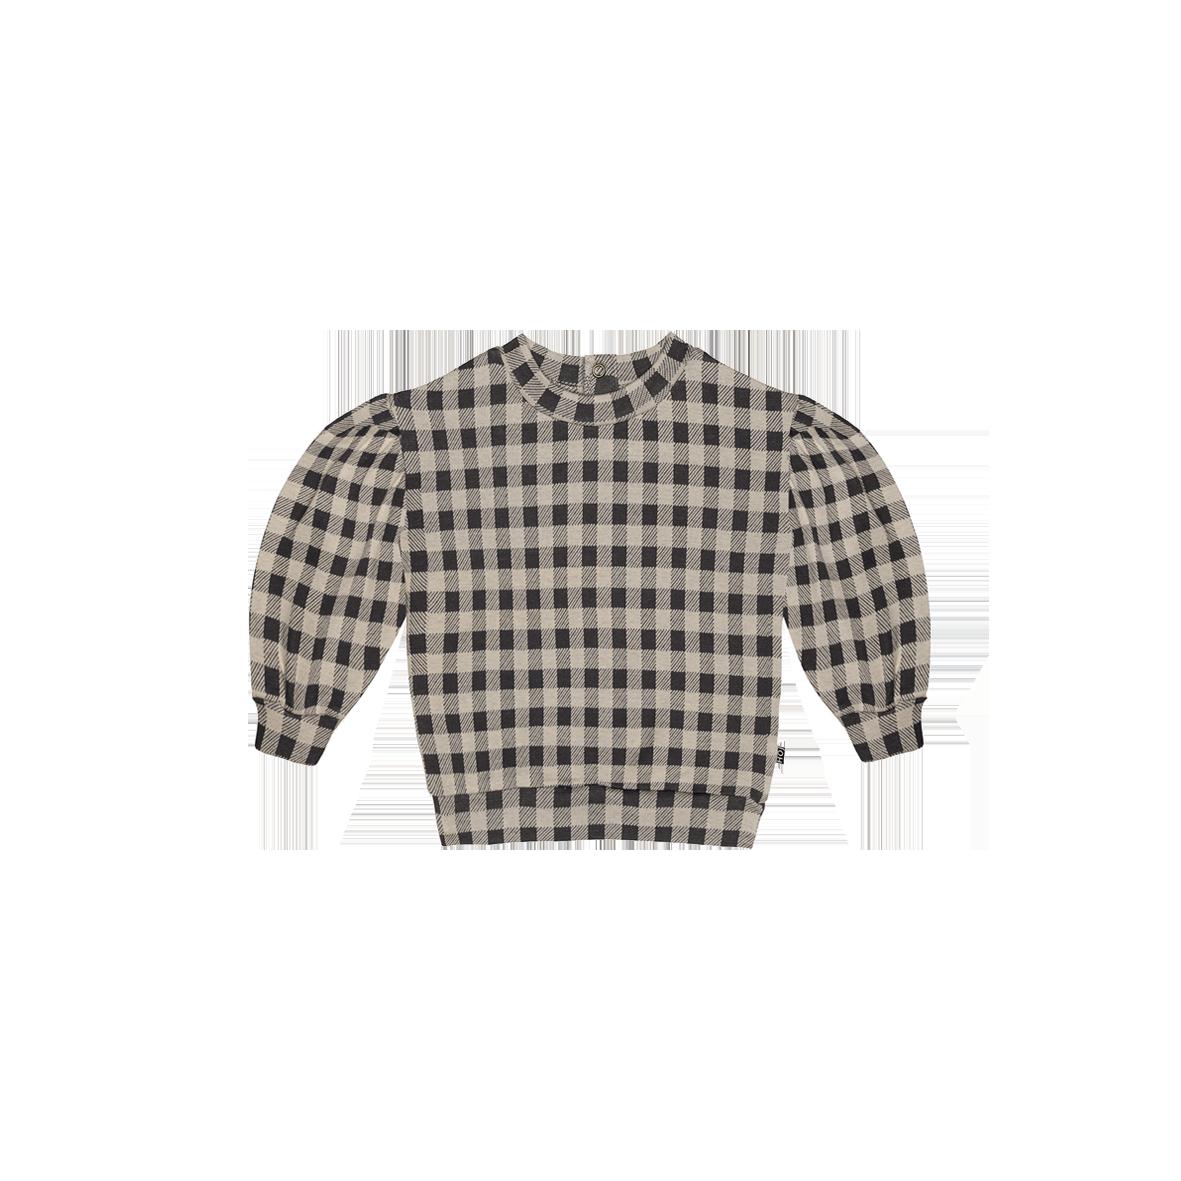 Balloon Sweater Charcoal Vichy